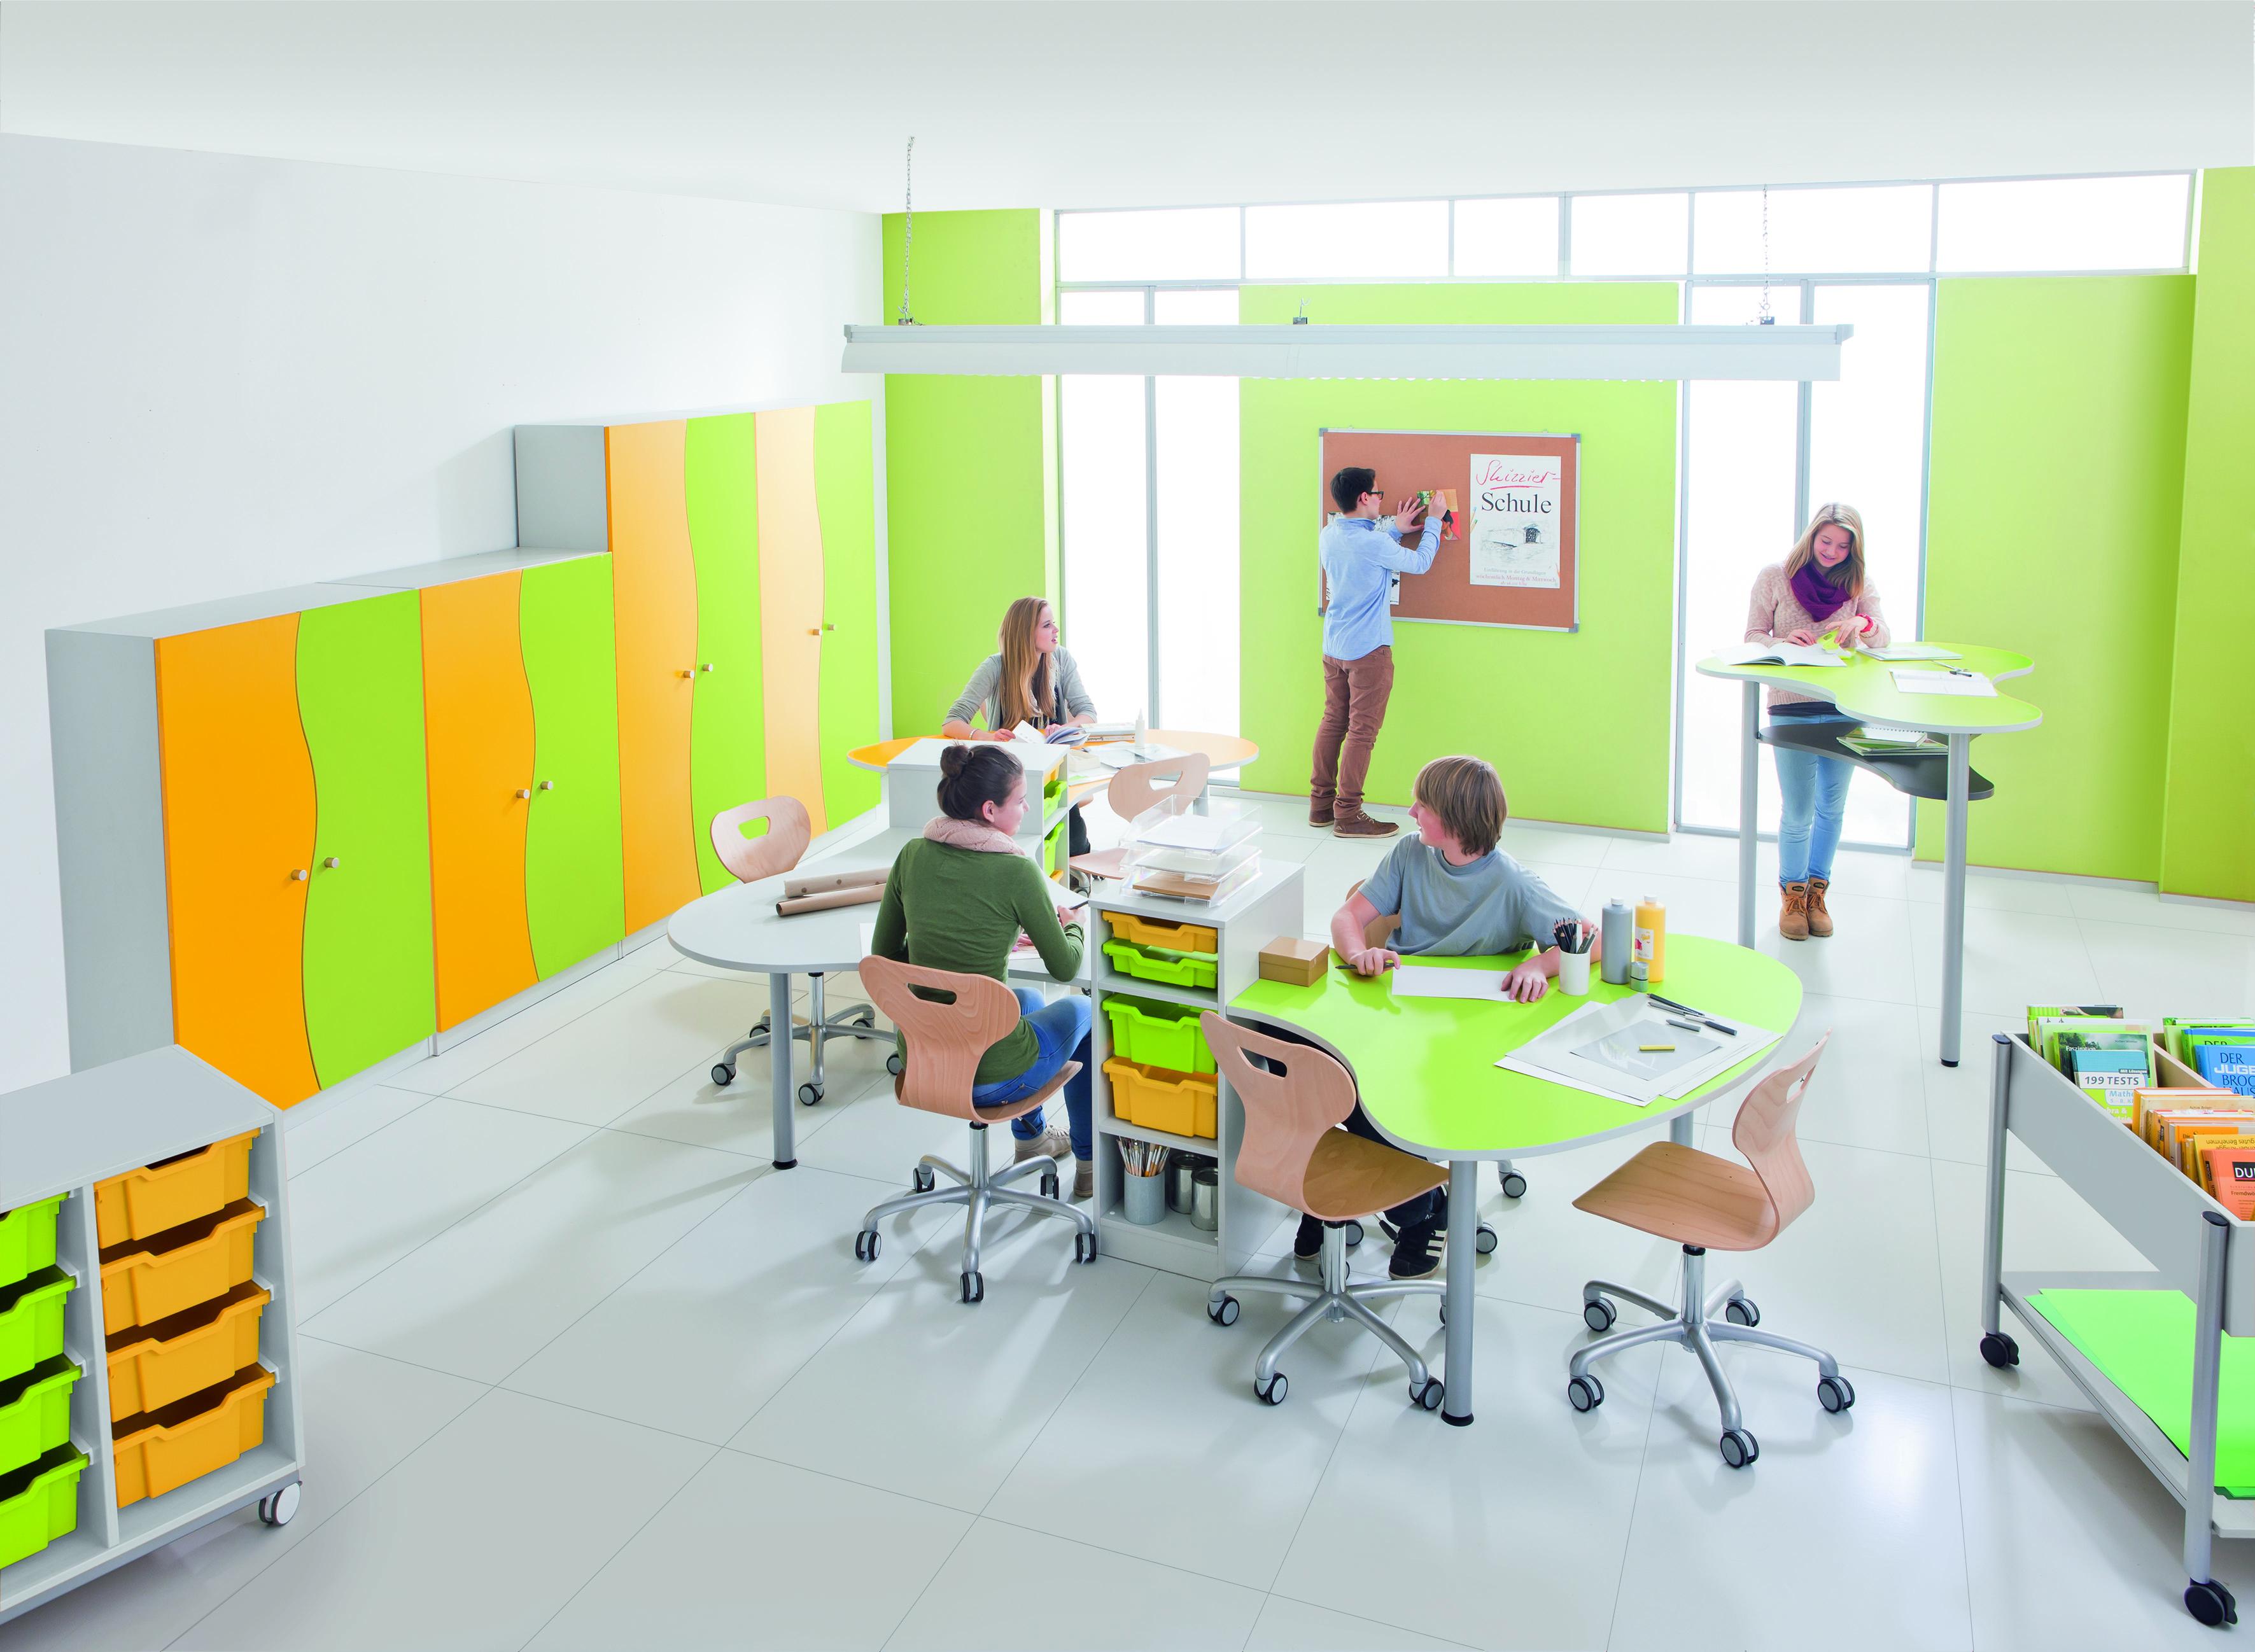 Schoolmeubilair oostenbrug interieur en advies for Interieur advies gratis